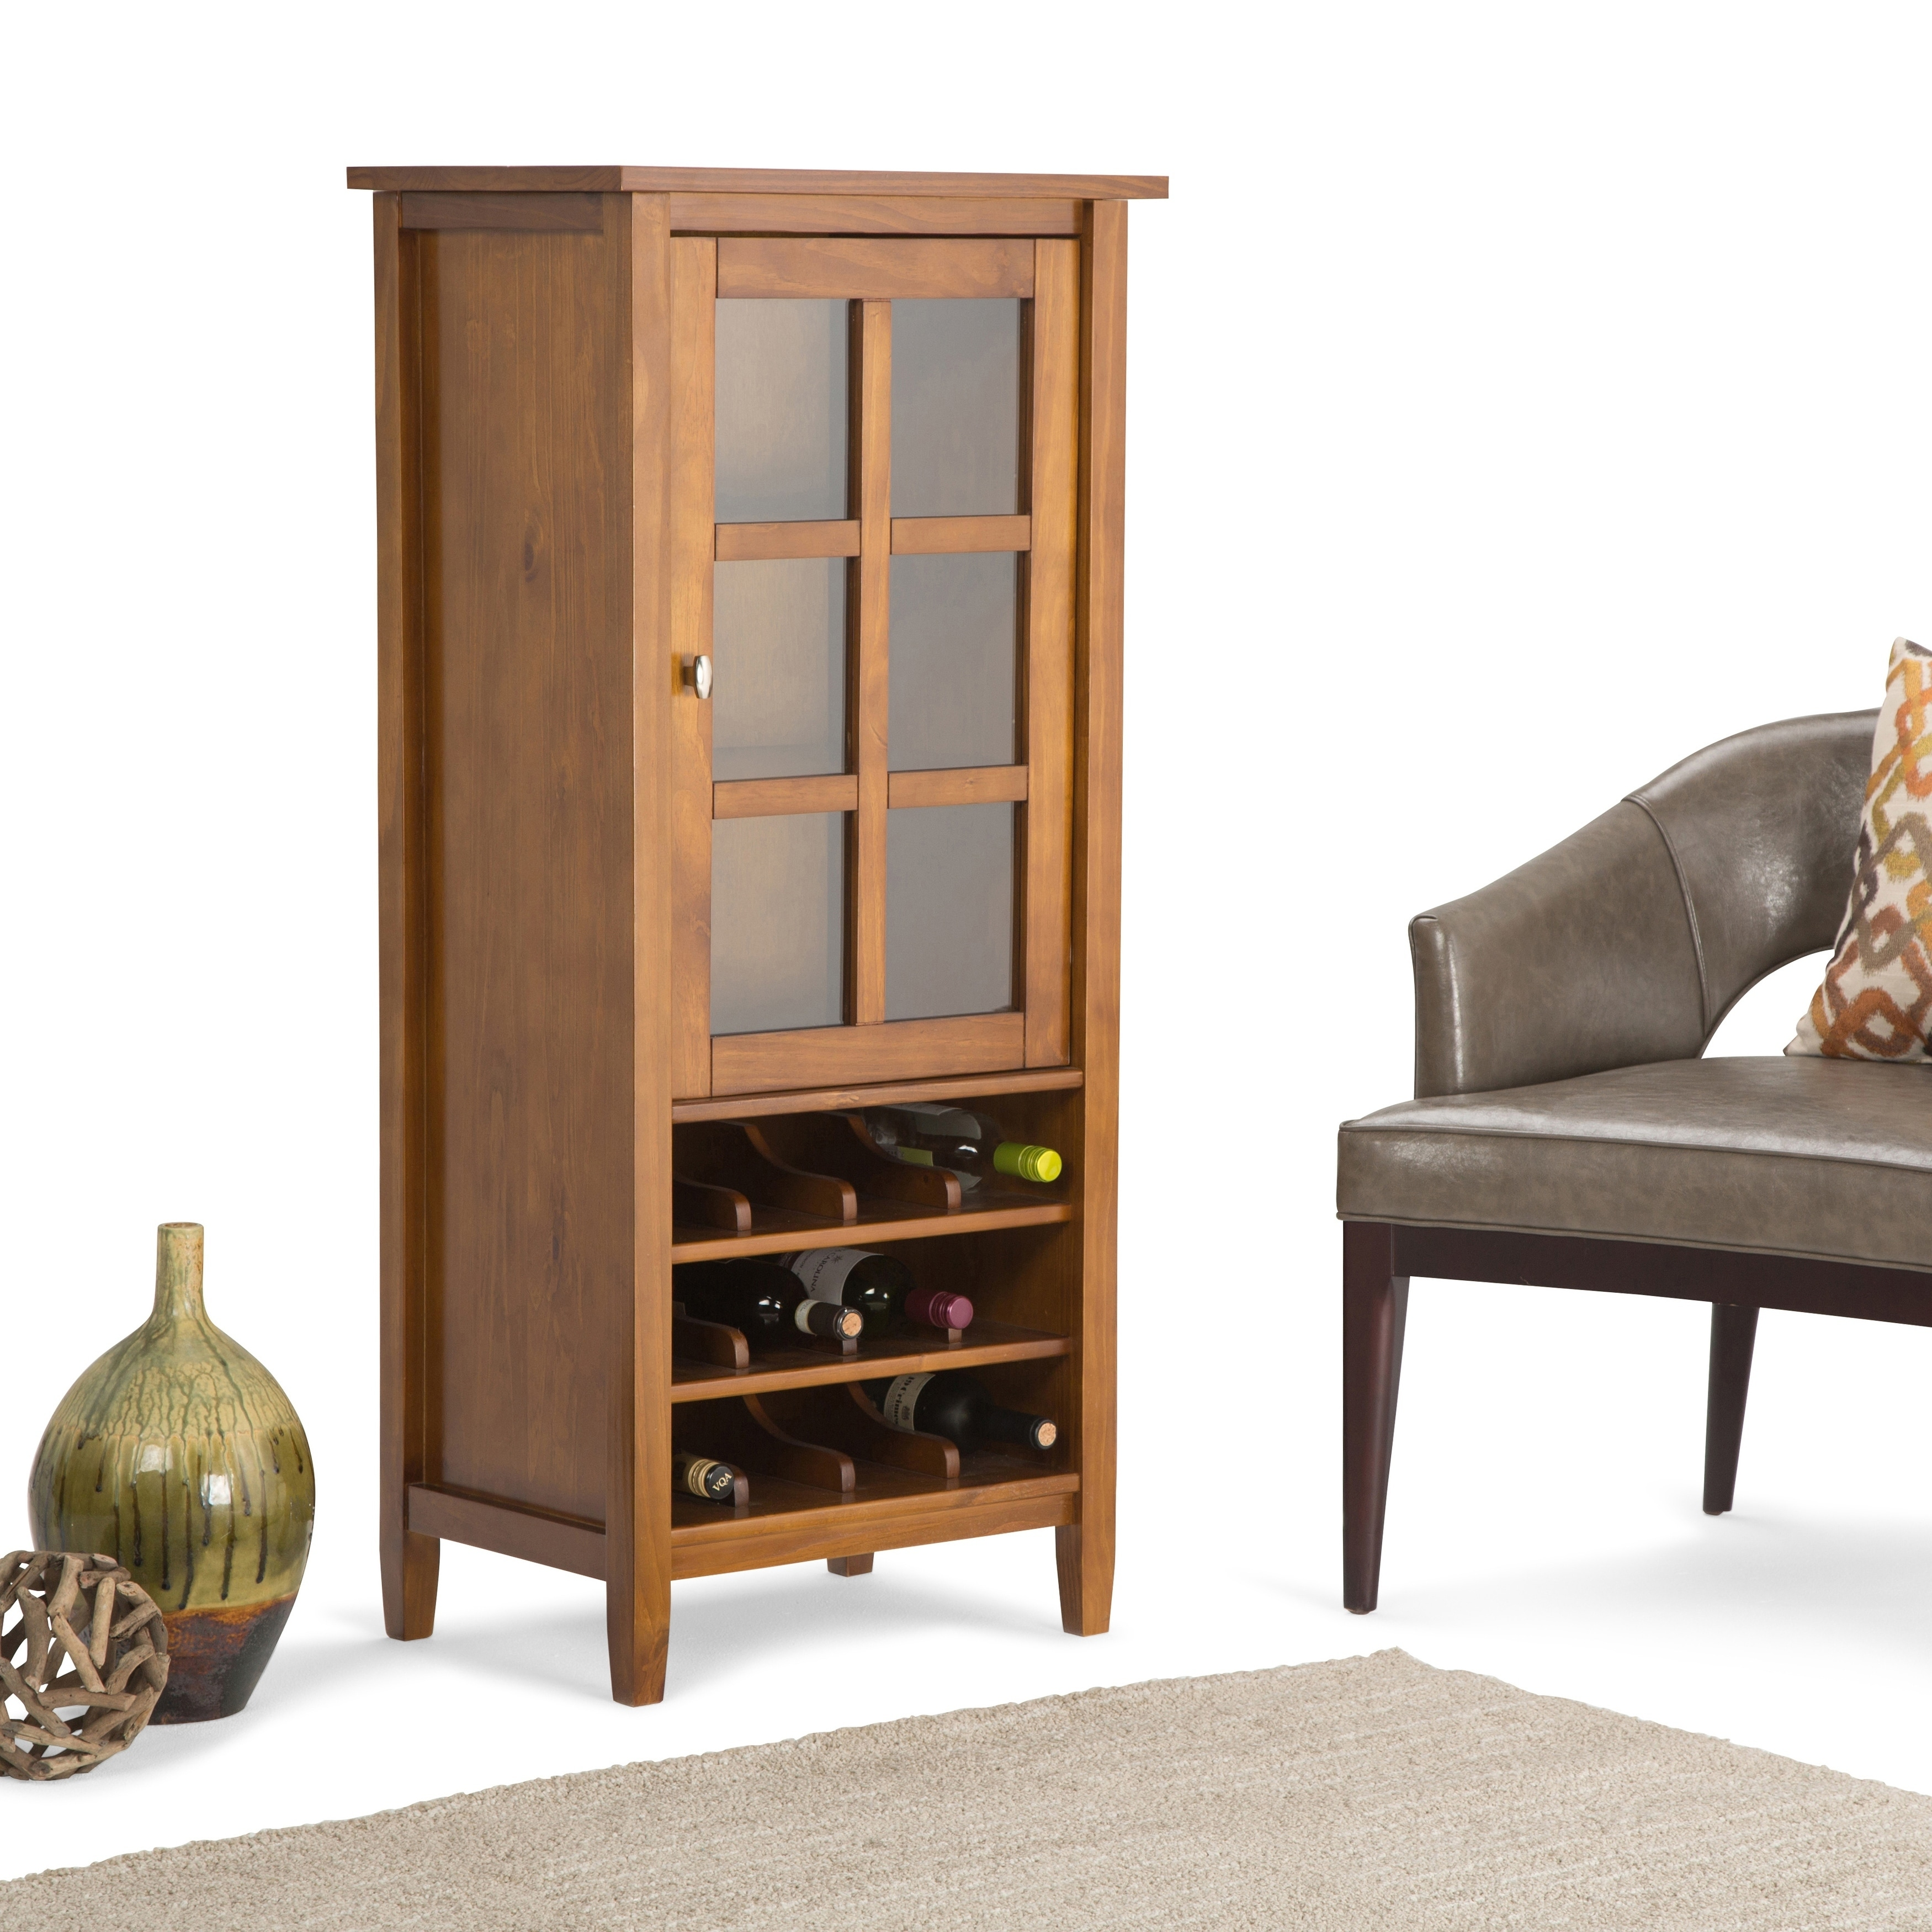 Wyndenhall Norfolk 12 Bottle Solid Wood 23 Inch Wide Rustic High Storage Wine Rack